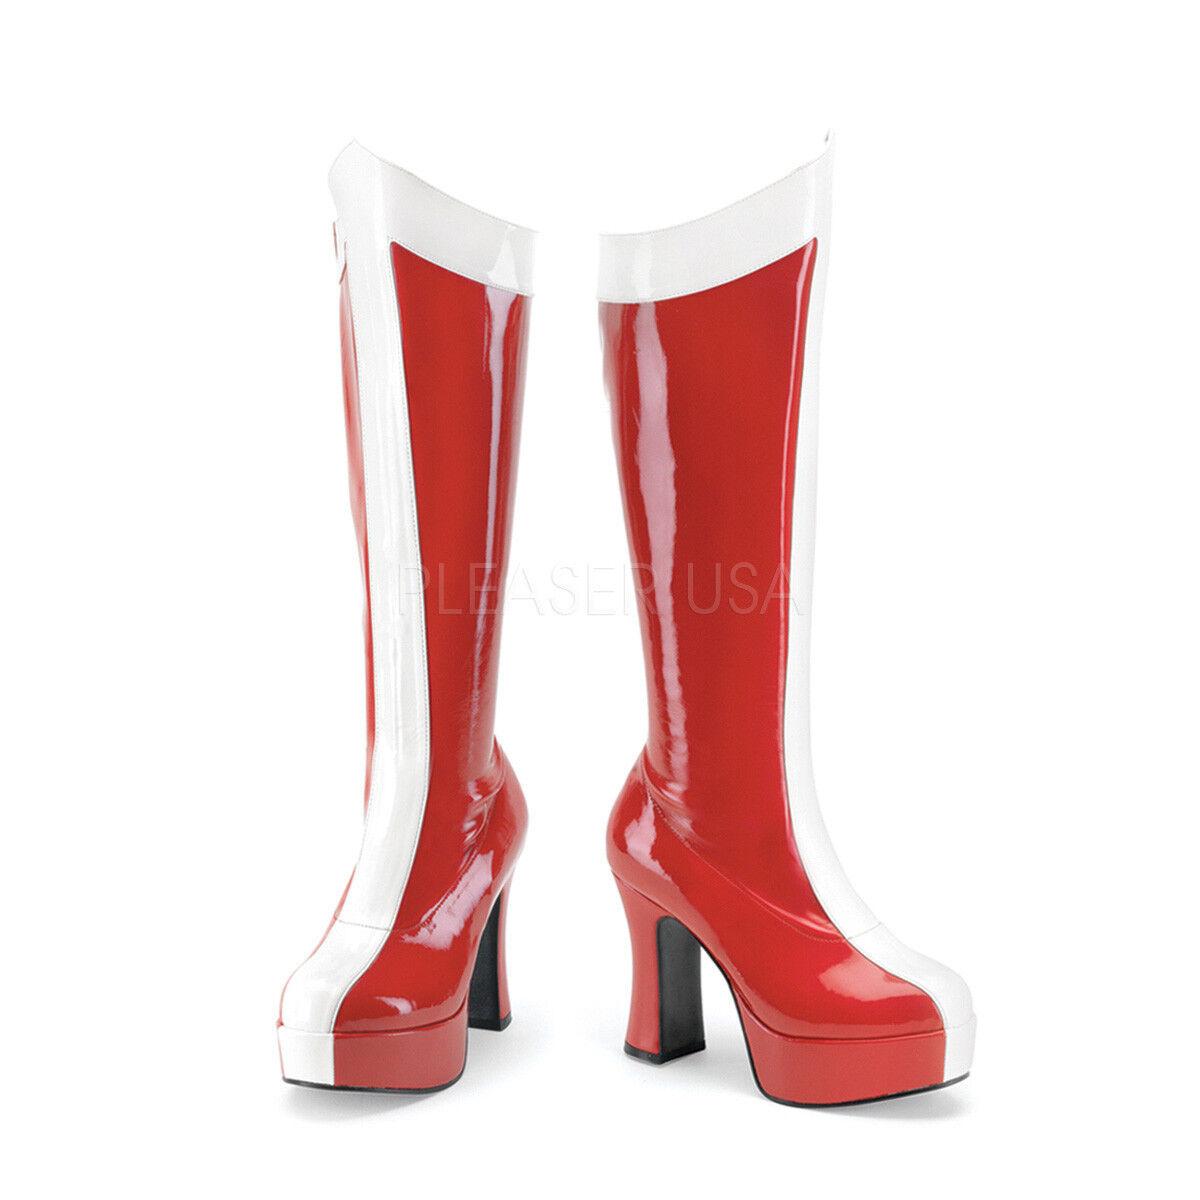 Red White Wonder Woman Cosplay Platform Platform Platform Costume Knee High Boots size 7 8 9 10 11 e453d8